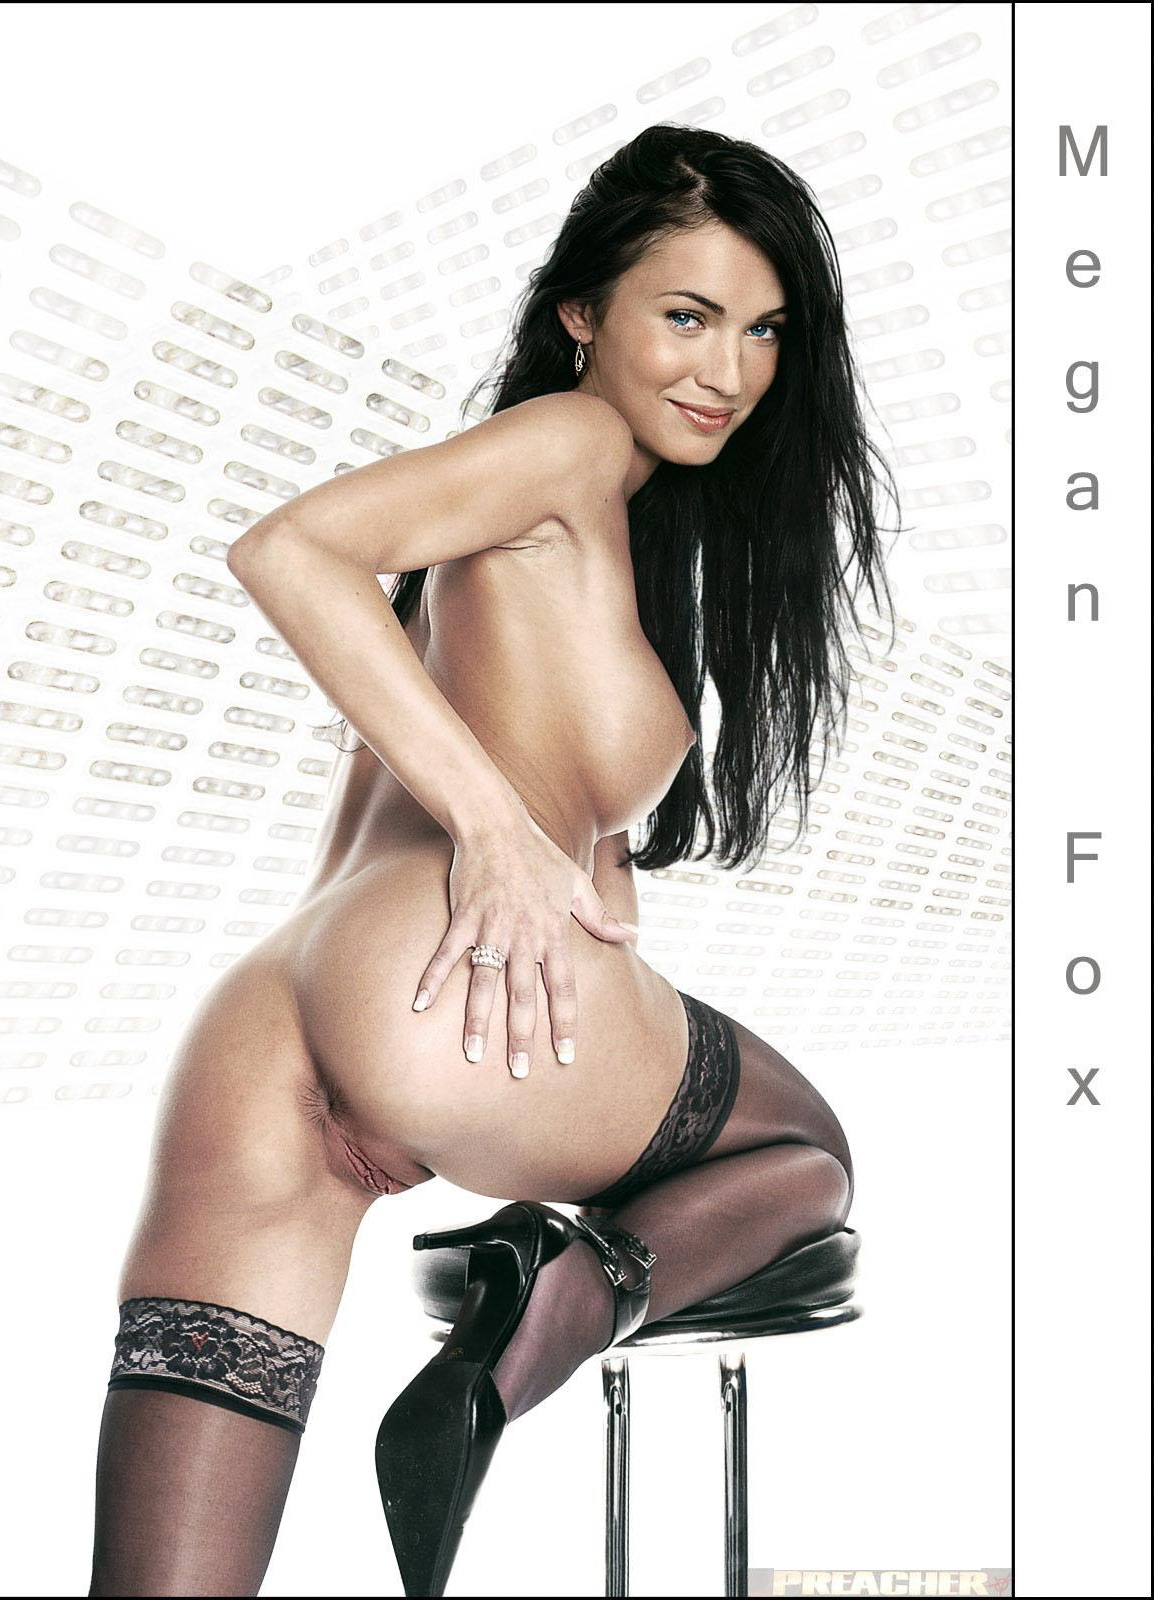 Megan Fox Pussy Hole